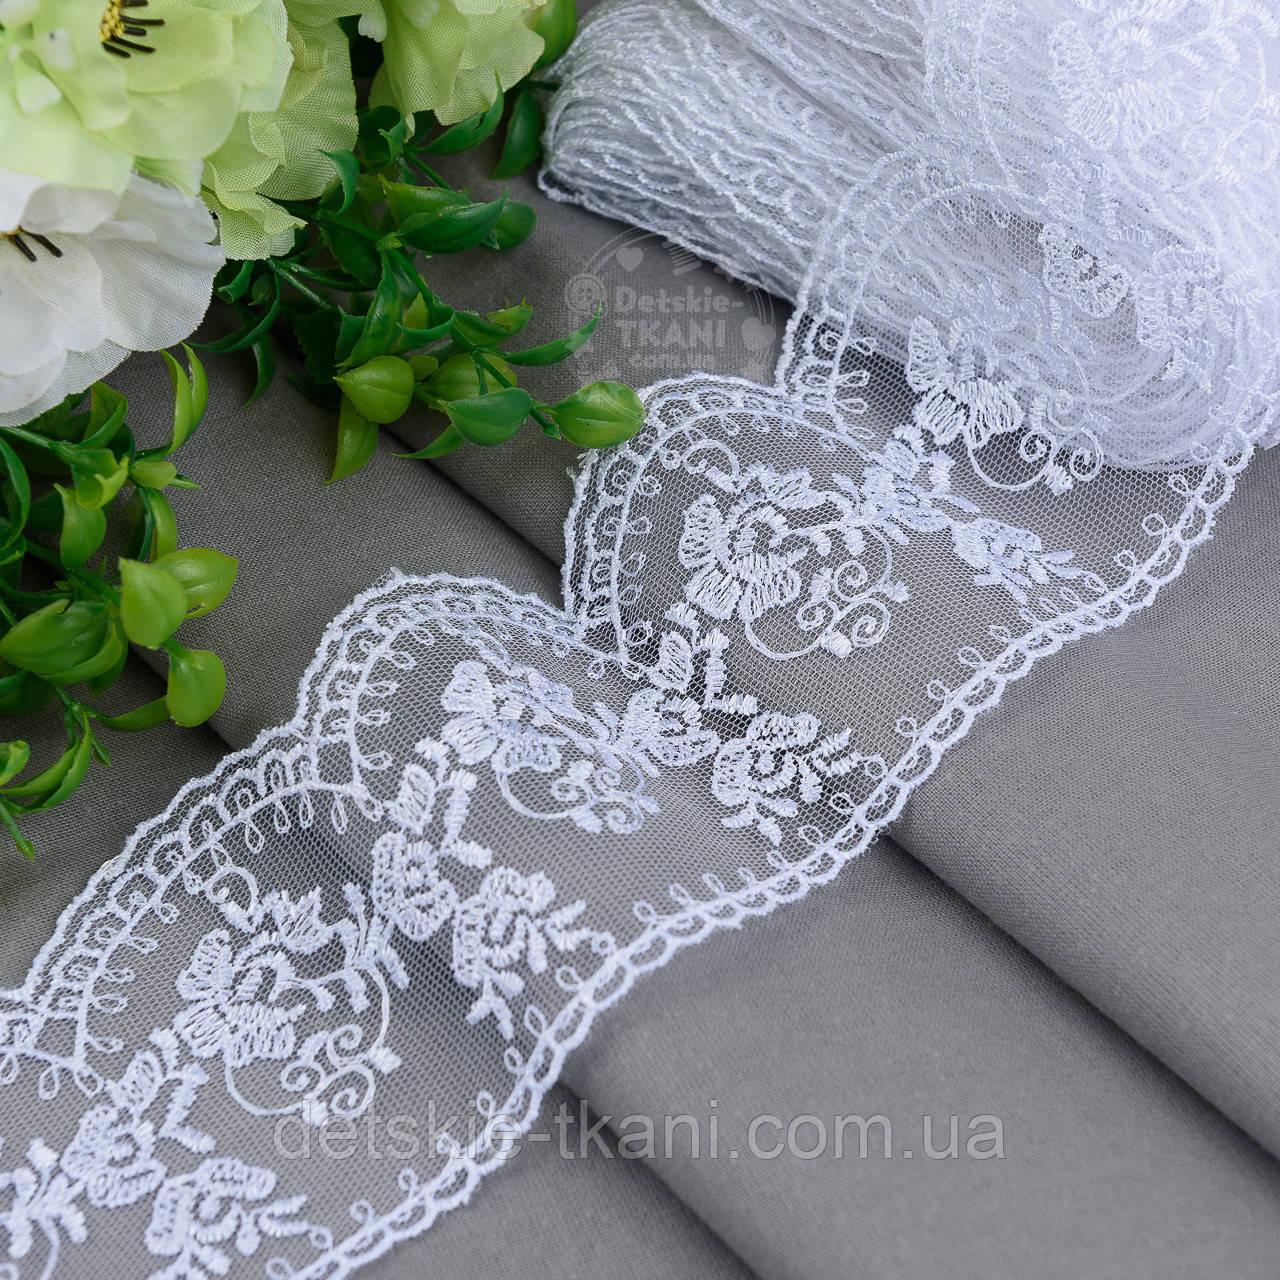 https://images.ua.prom.st/1095368045_w640_h640_kruzhevo-beloe-shirinoj.jpg